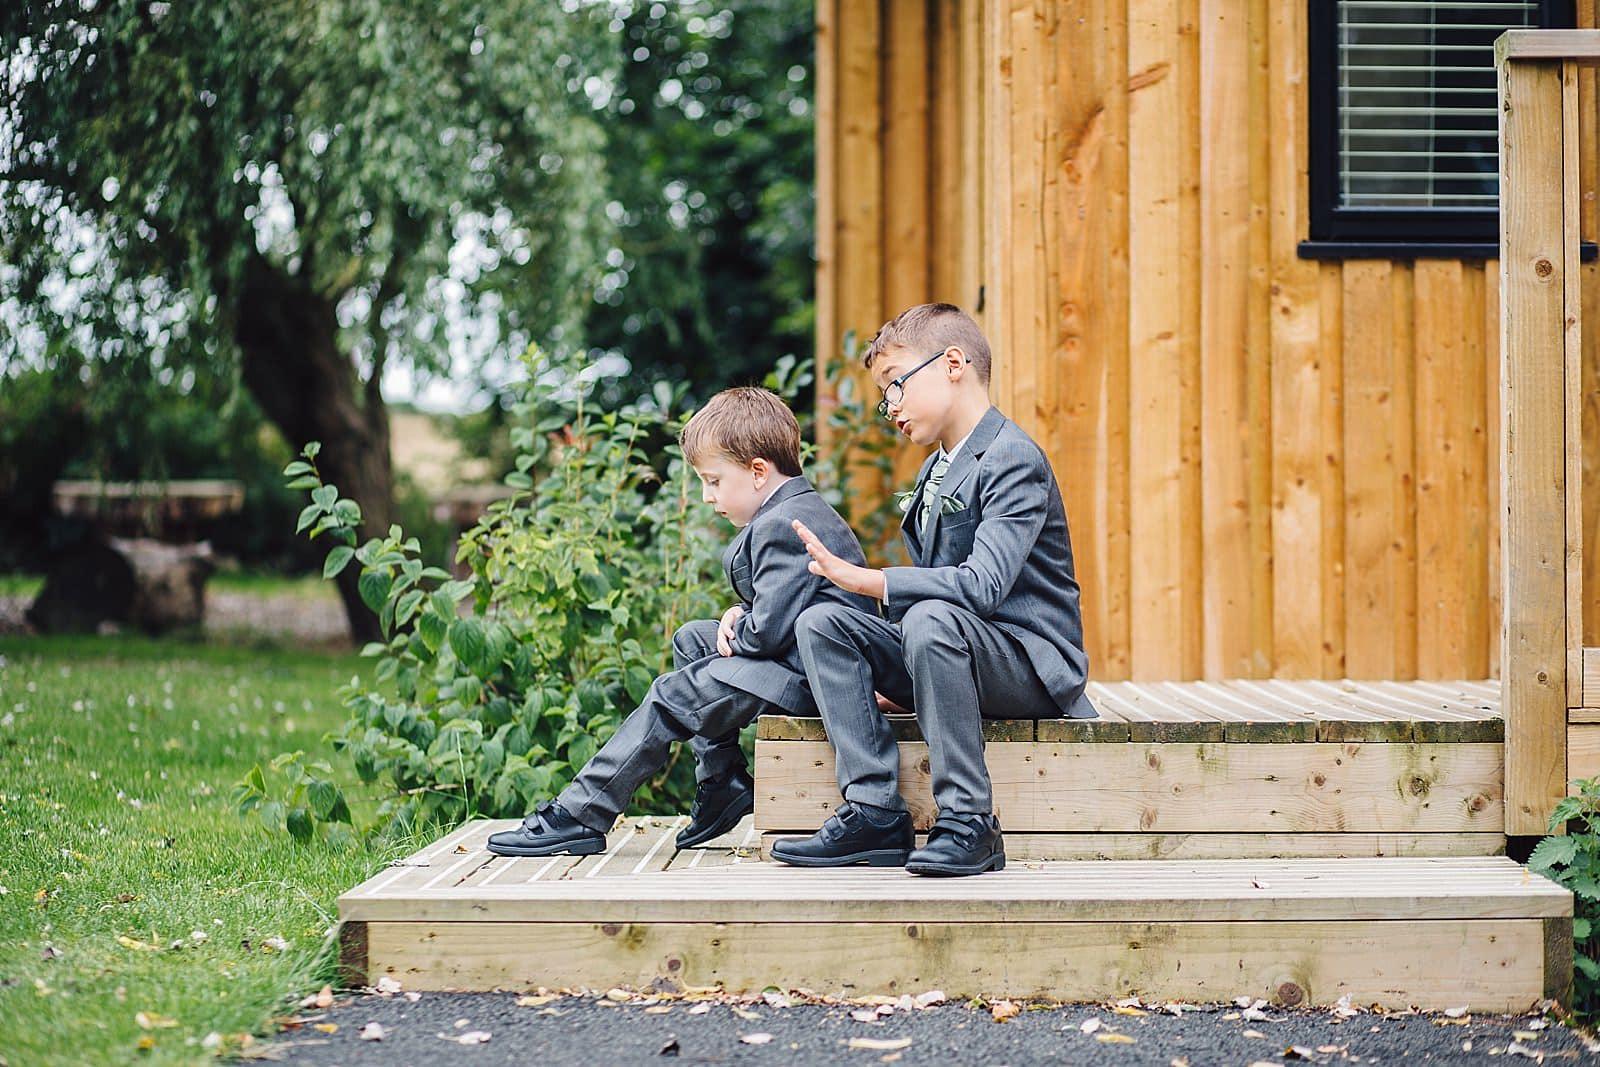 hothorpe-hall-woodlands-wedding-photography_0020